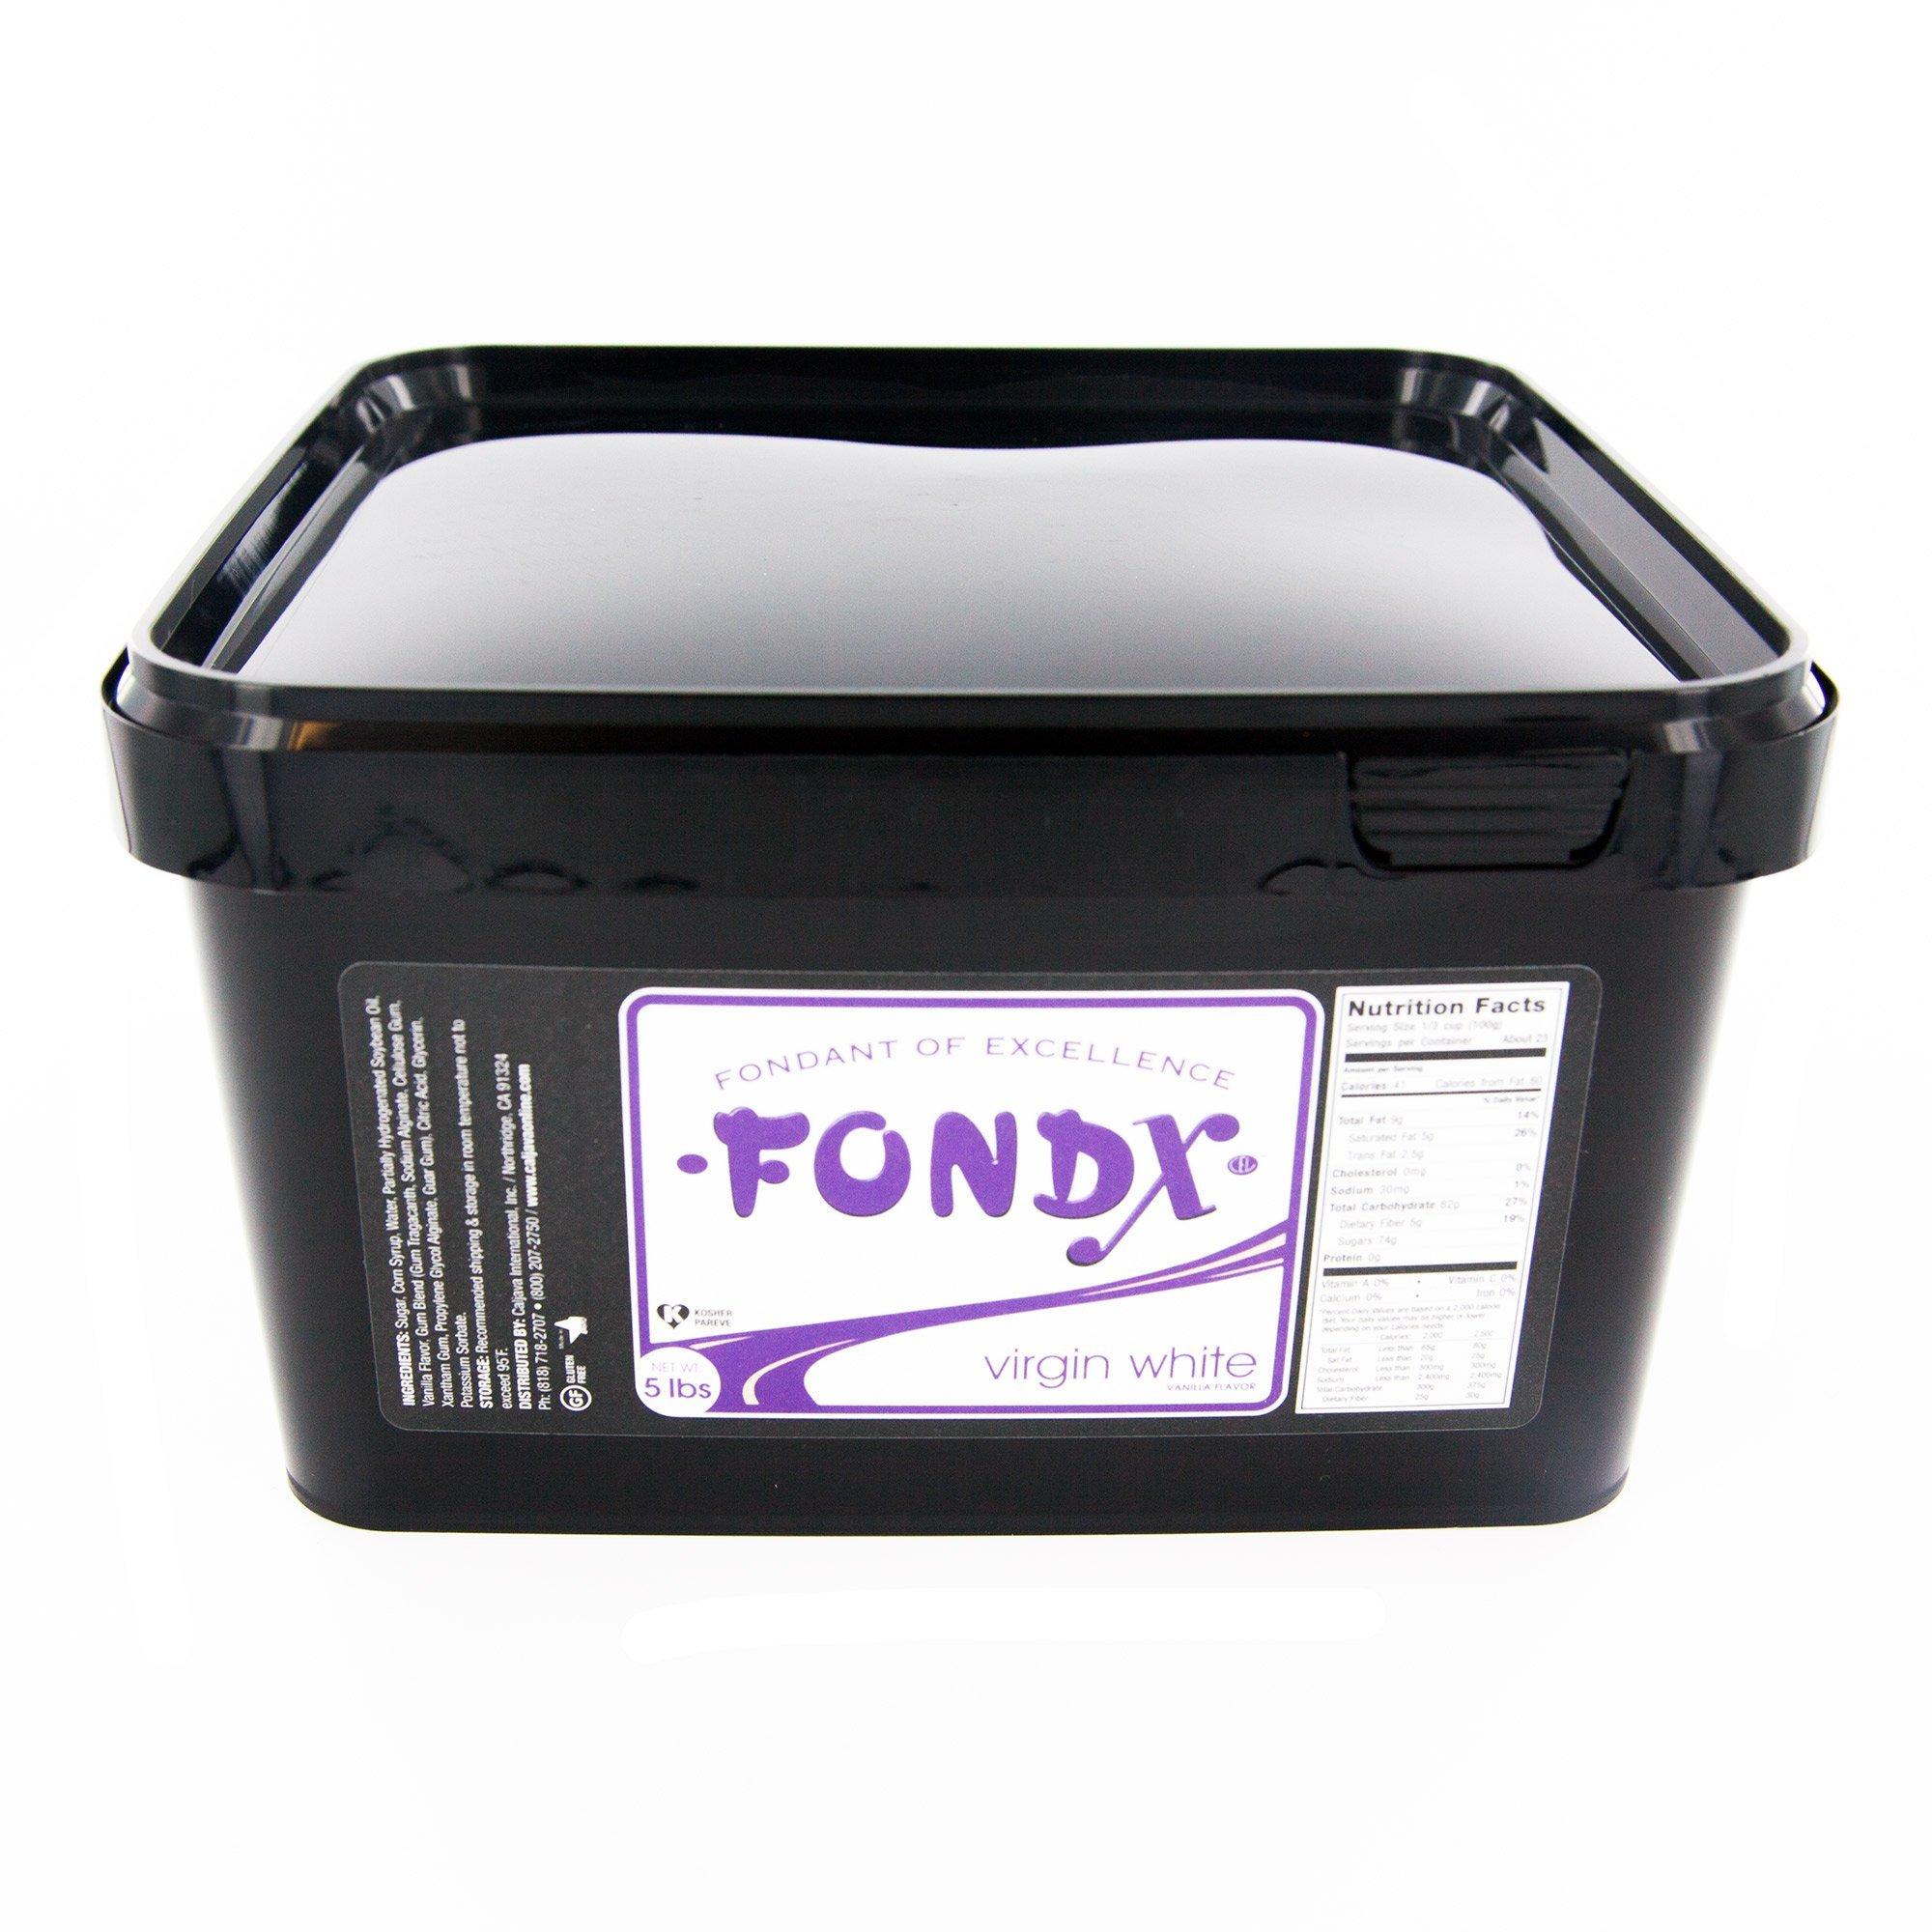 FondX Rolled Fondant Icing Virgin White 5 Pounds